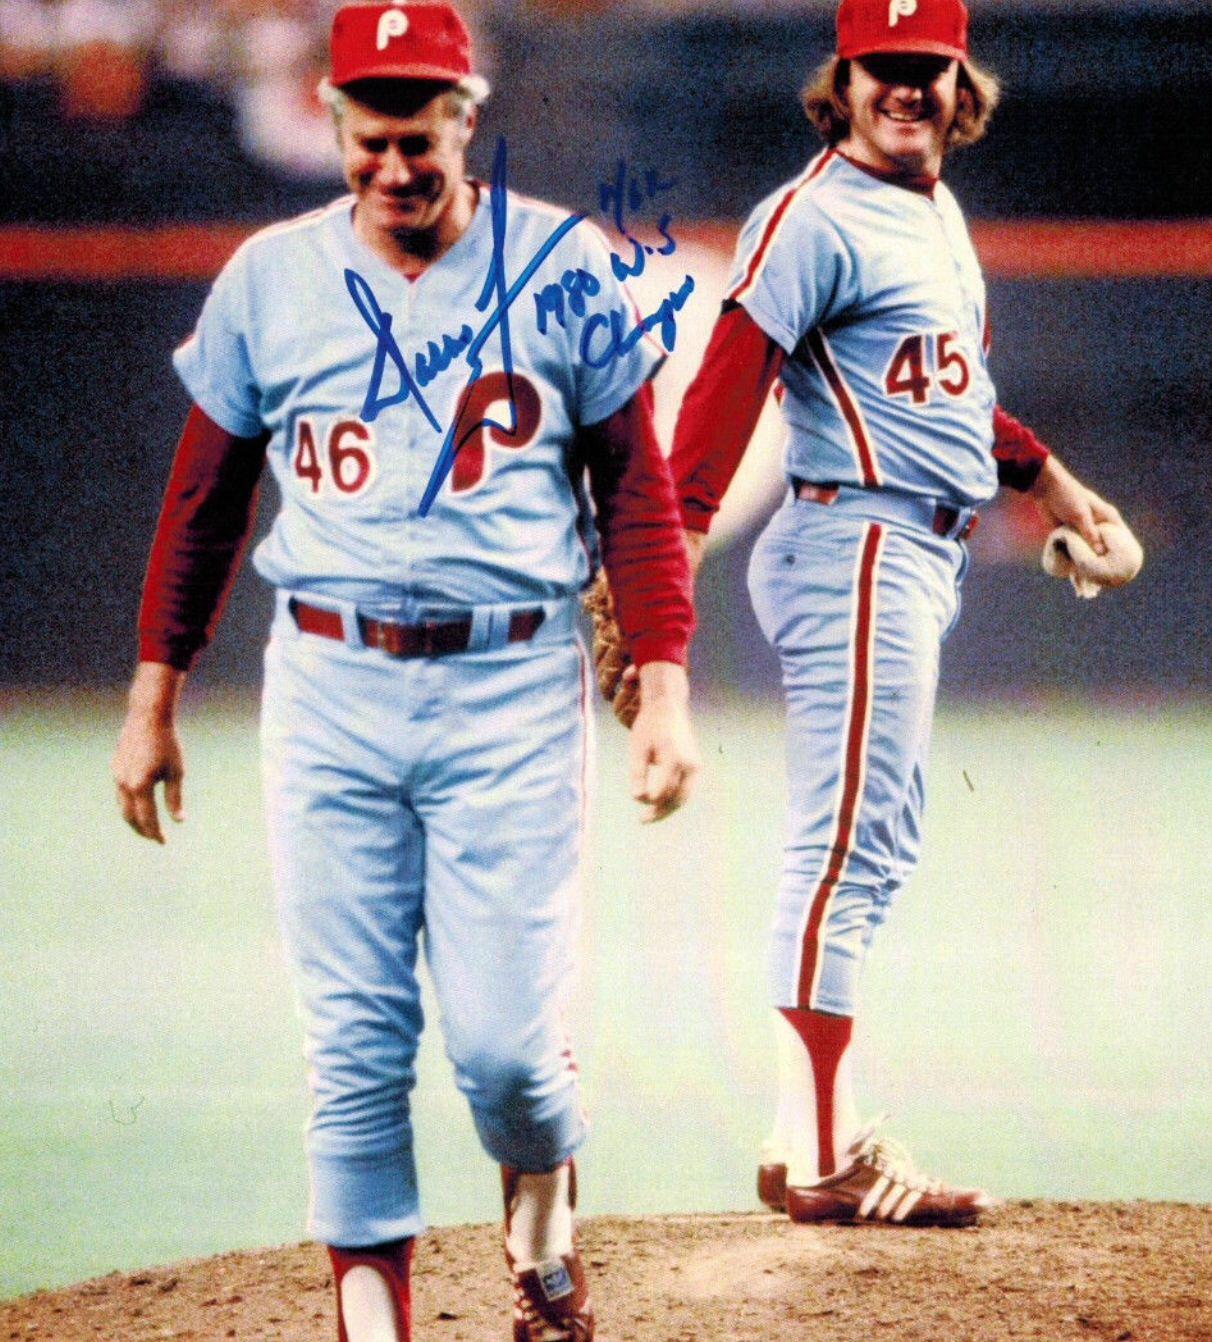 Dallas Green Amp Tug Mcgraw 1980 Nlcs Phillies Baseball